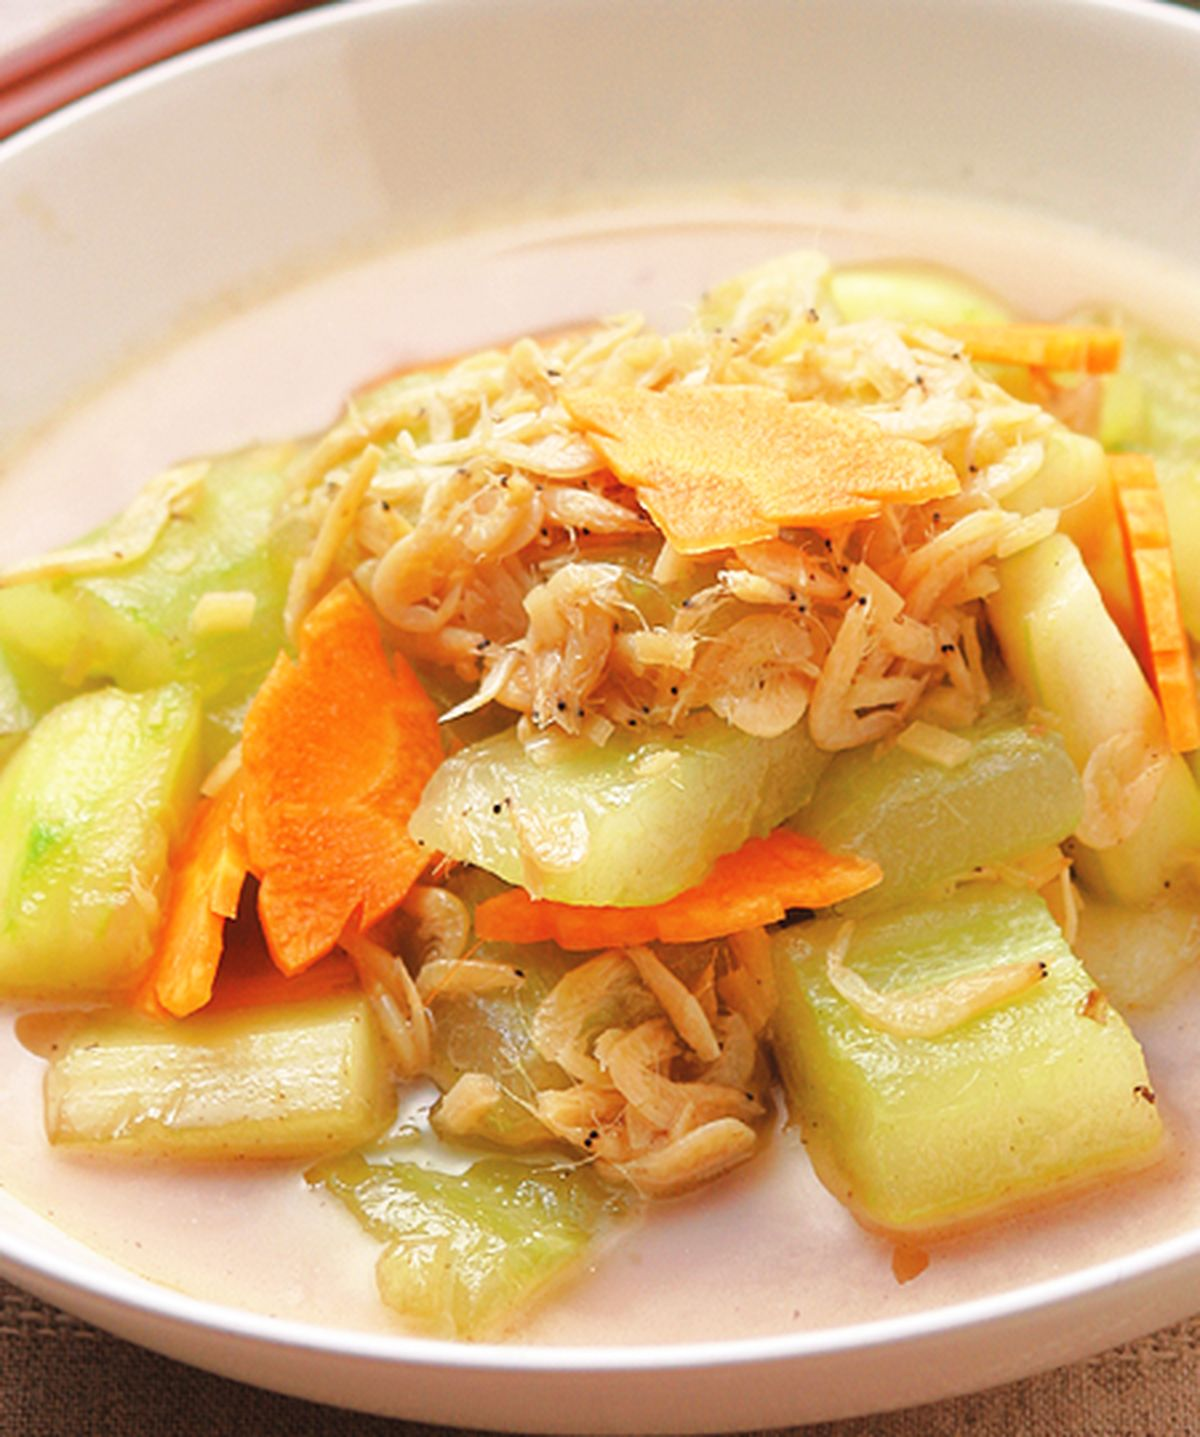 食譜:蝦皮大黃瓜